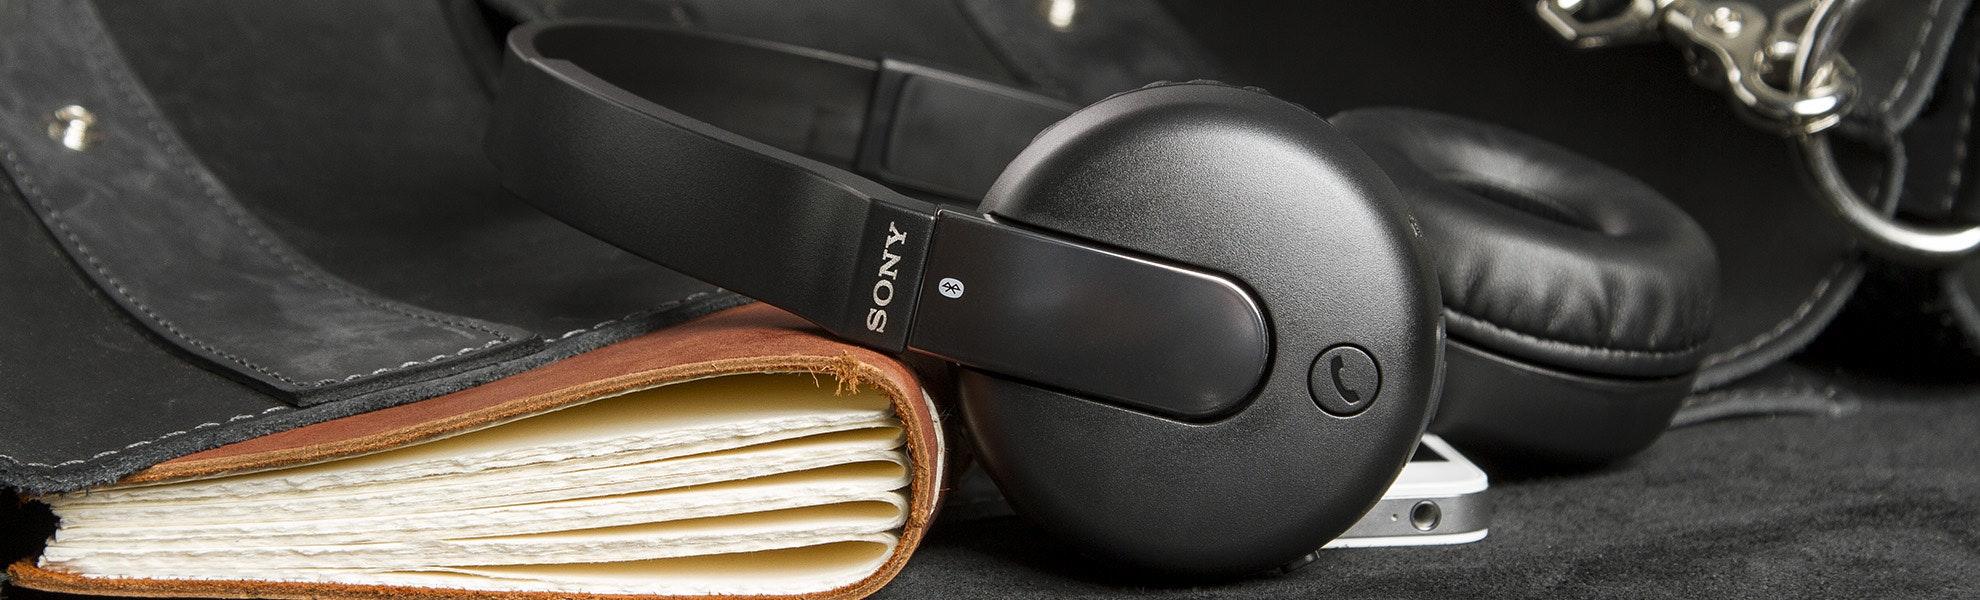 Sony DR-BTN200 Bluetooth Headphones